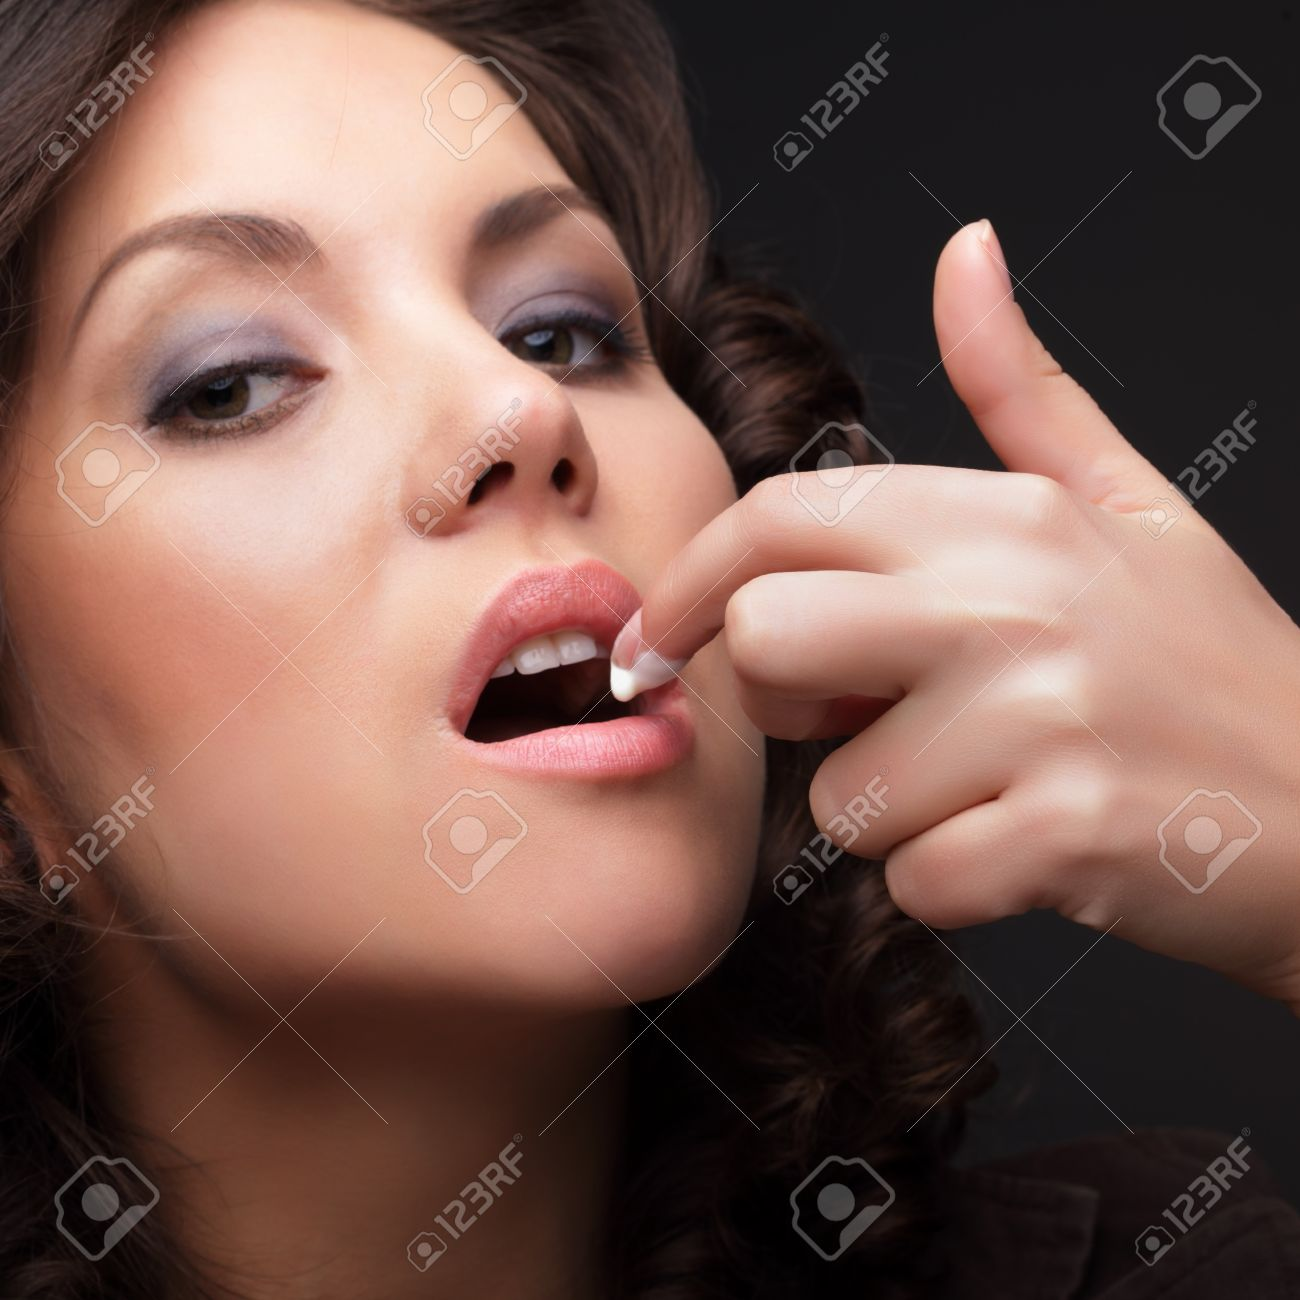 Busty cartoon sex